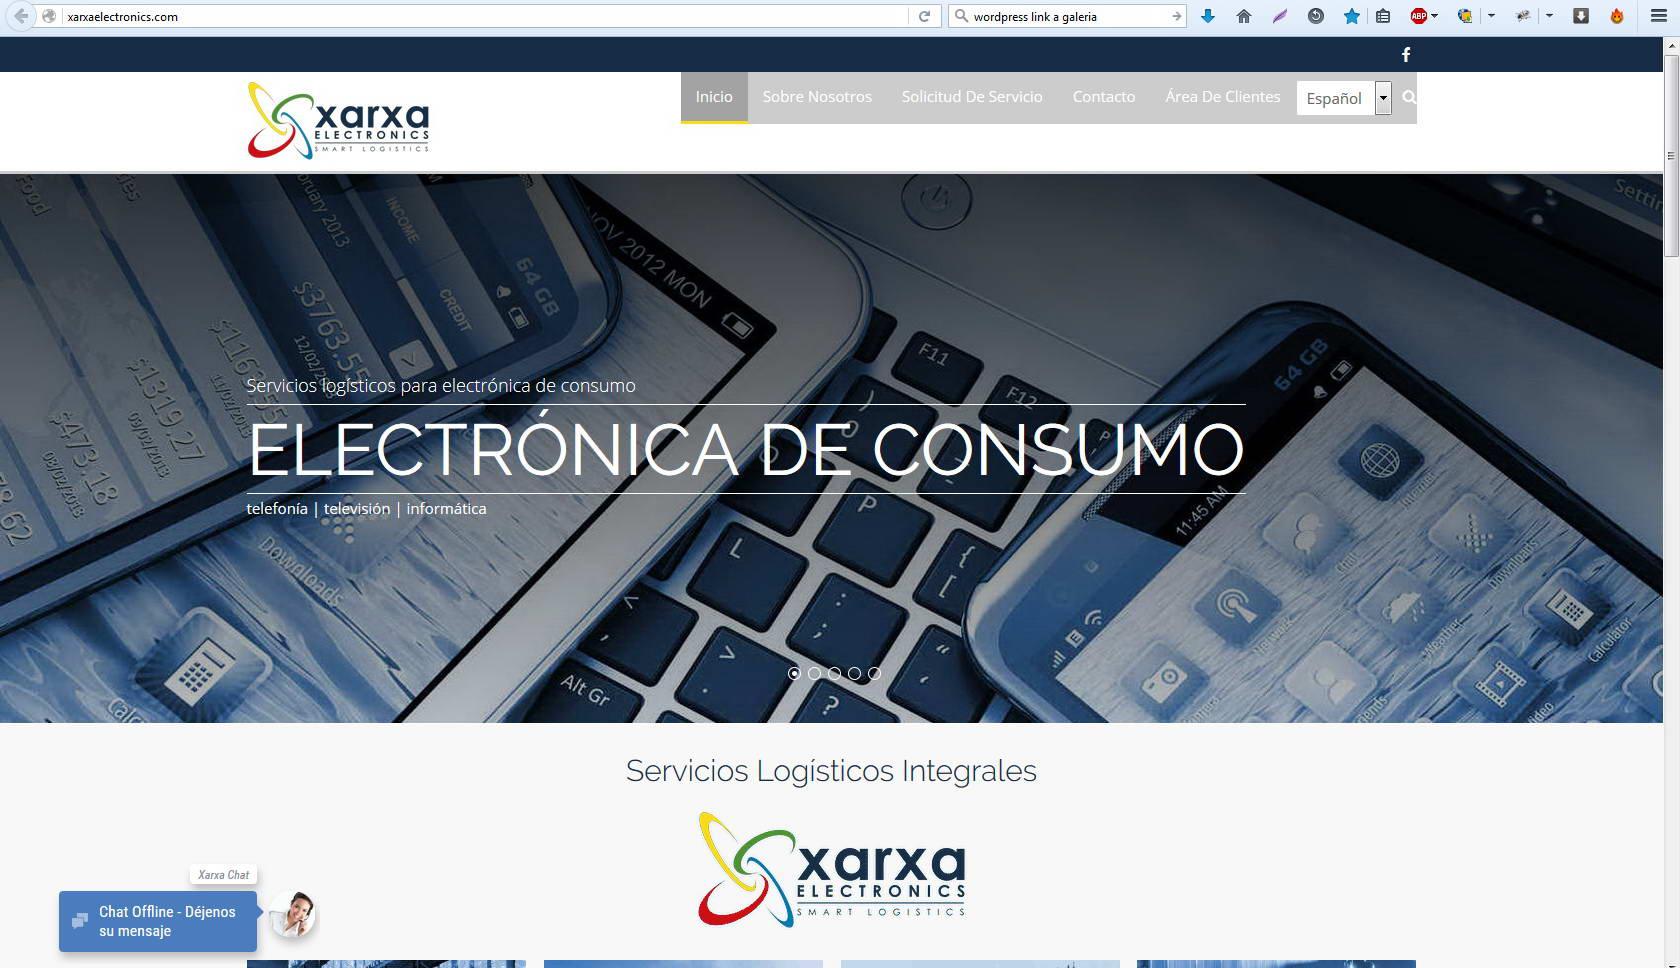 Webs: Xarxa electronics